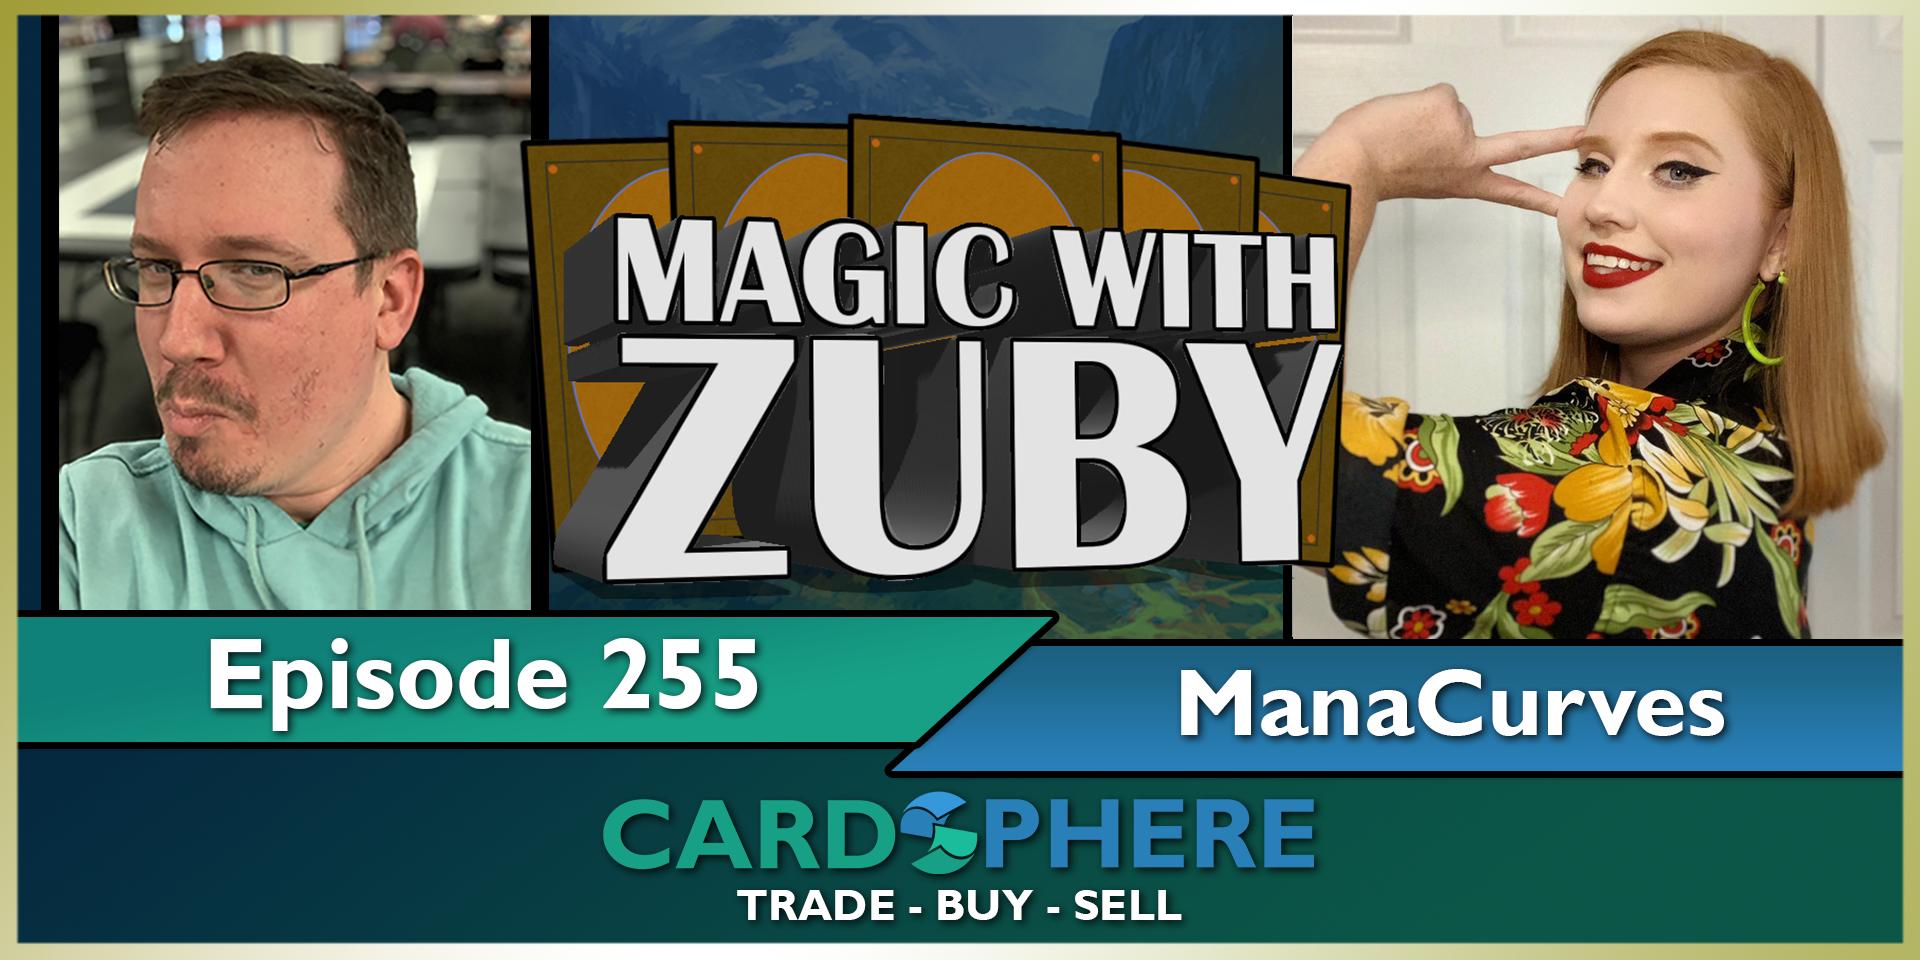 Magic With Zuby Episode 255 - Chase, aka Manacurves